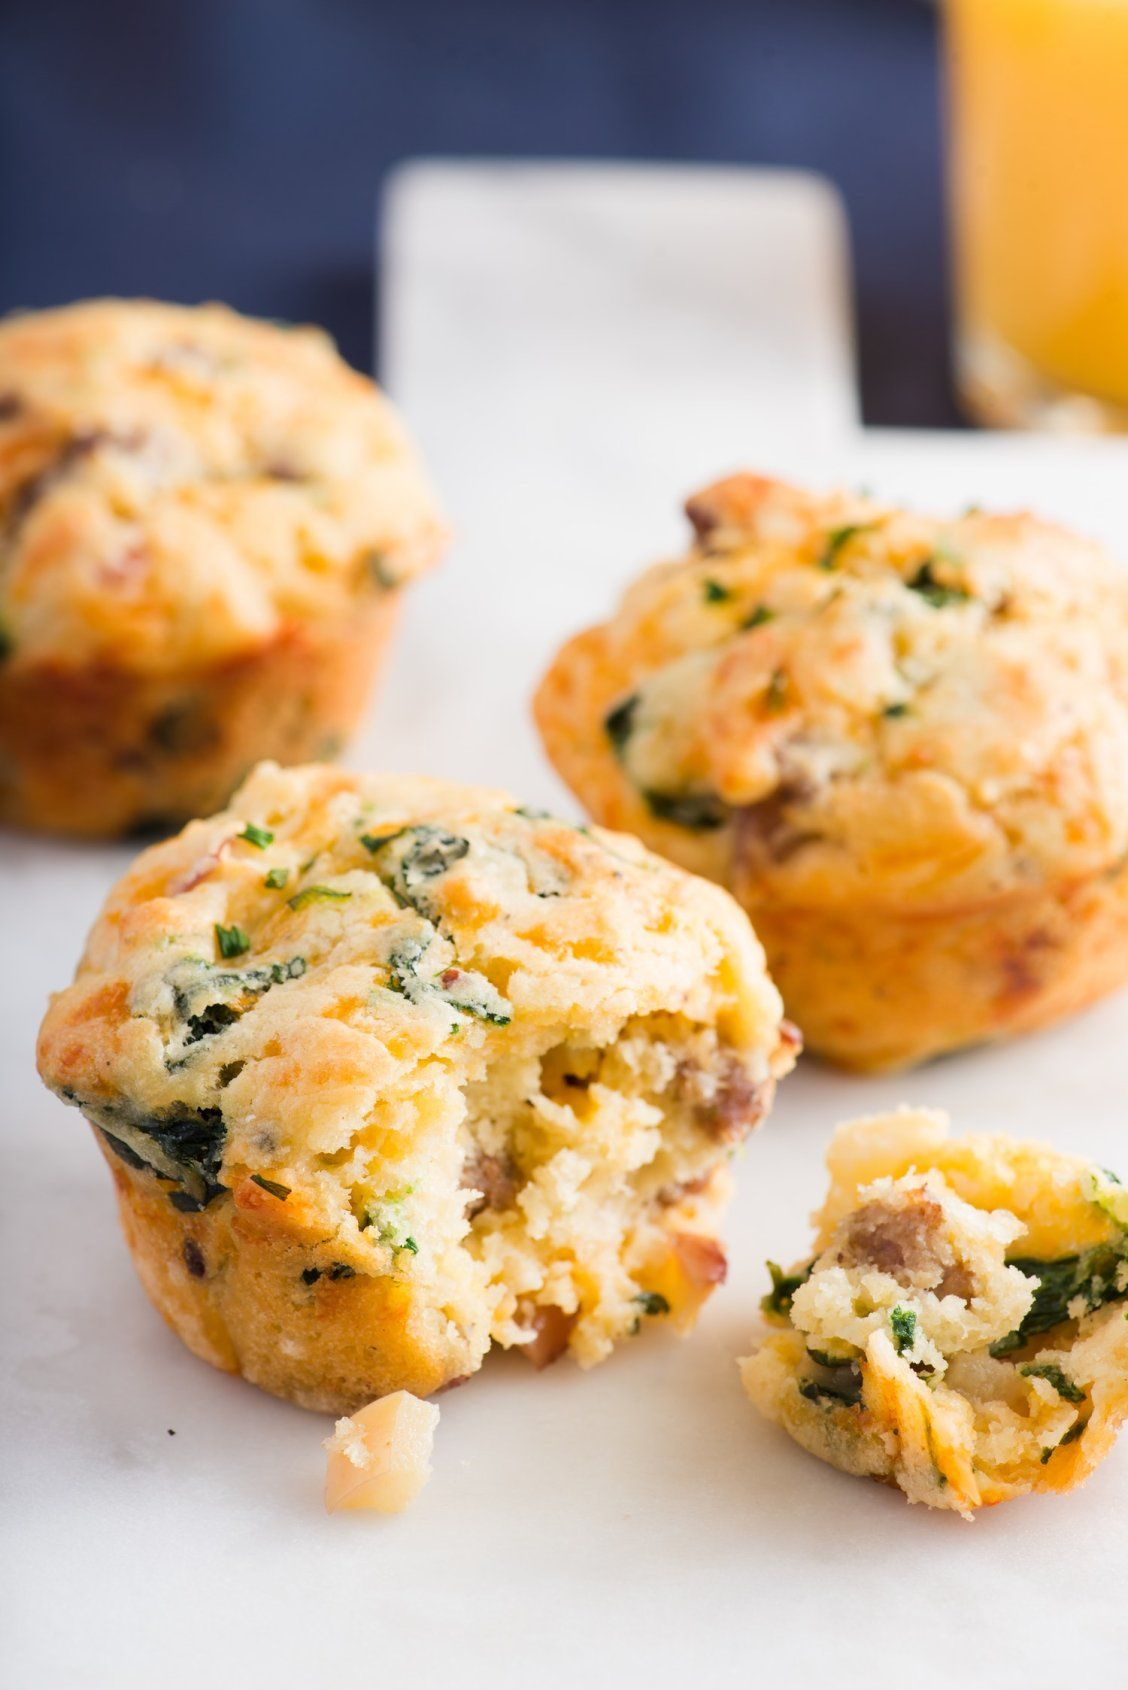 Recipe Loaded Savory Breakfast Muffins Recipe Savory Breakfast Muffins Breakfast Muffin Recipes High Protein Breakfast Recipes